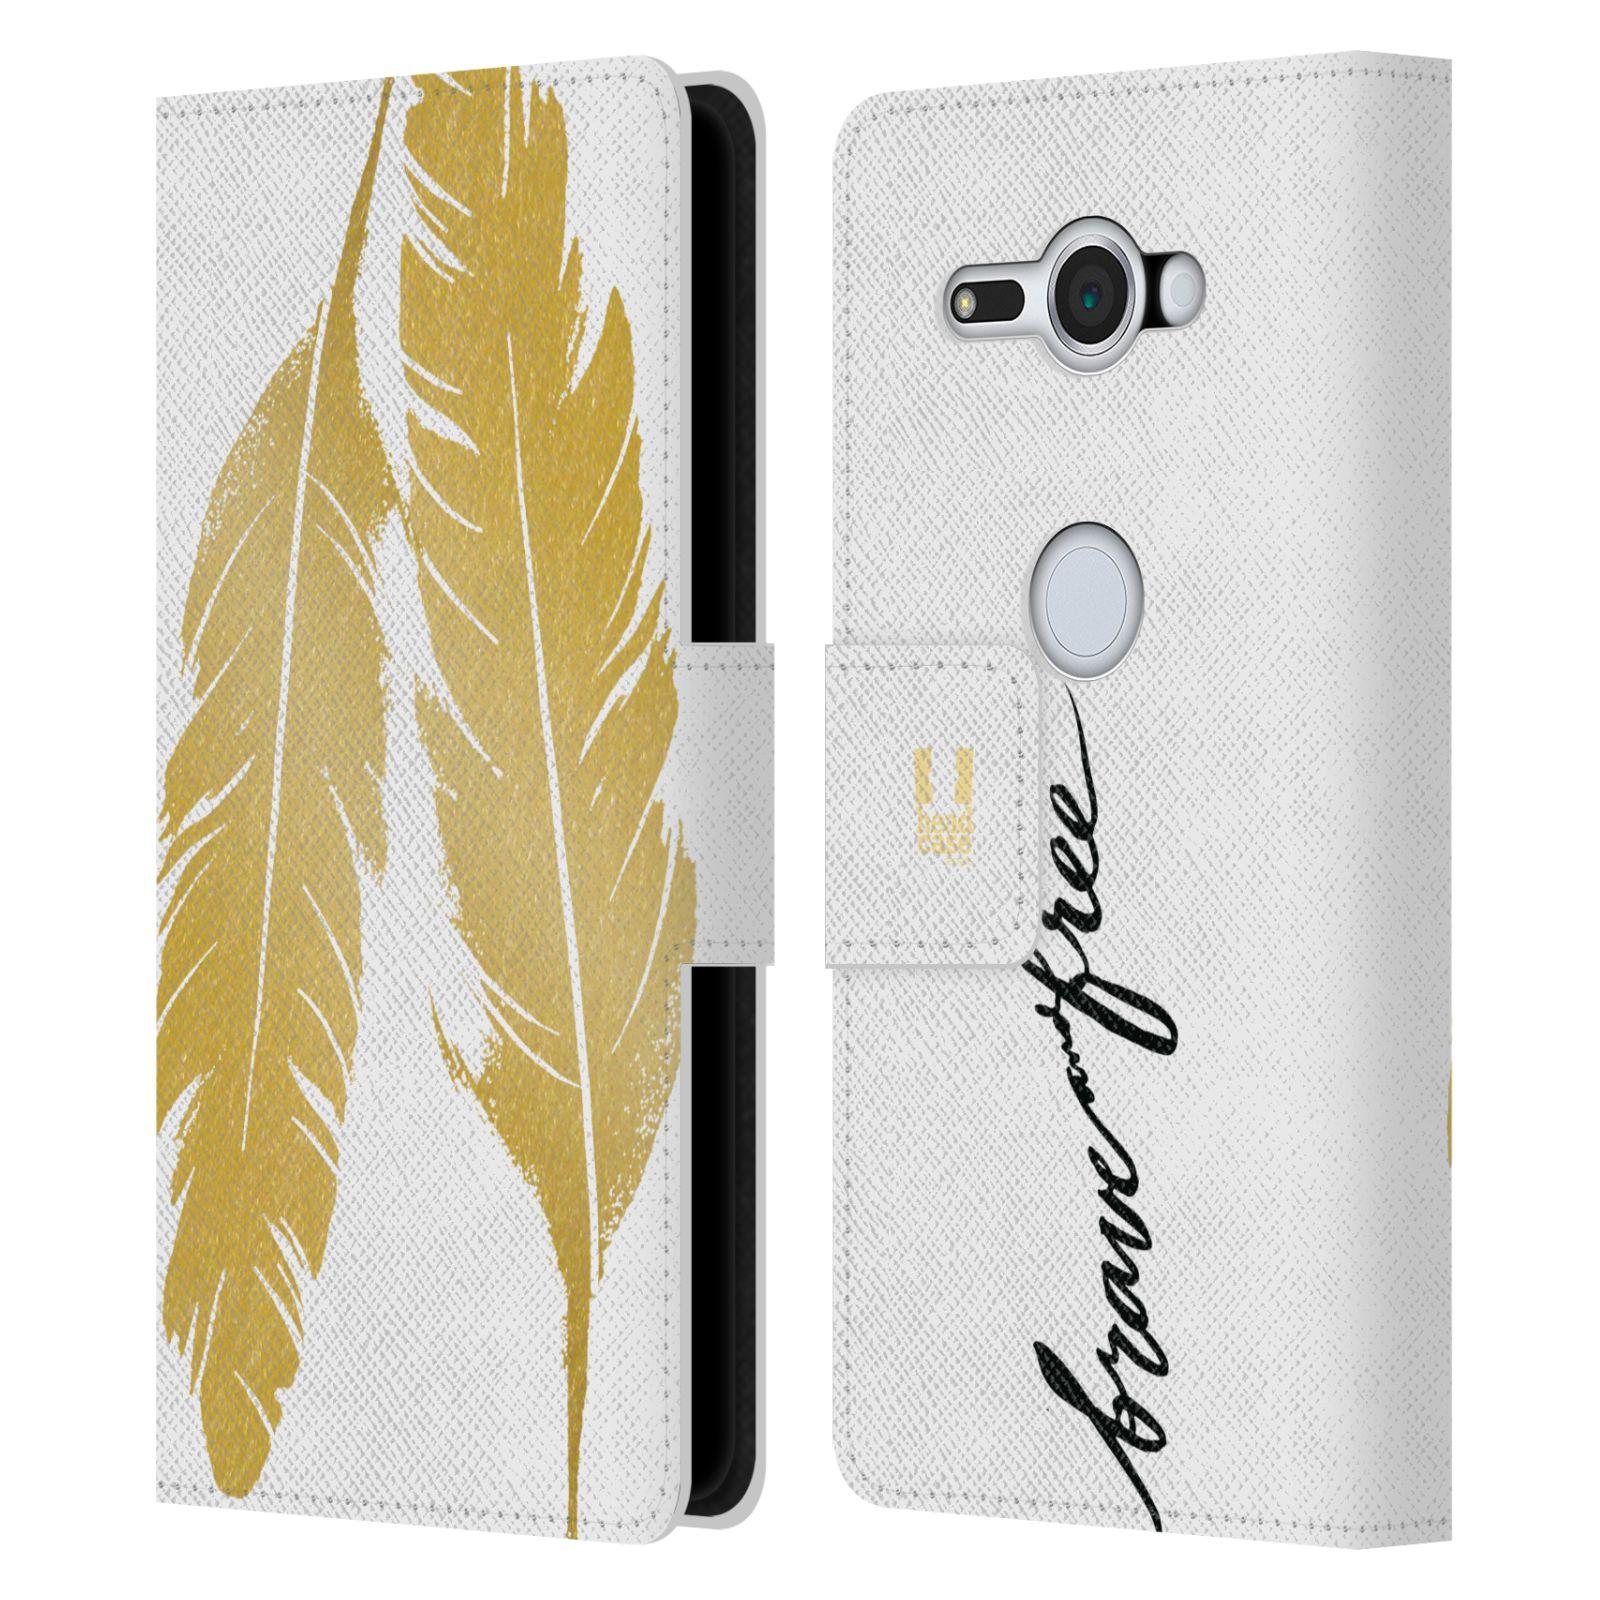 Pouzdro na mobil Sony Xperia XZ2 Compact - Head Case - Fashion zlaté pírka